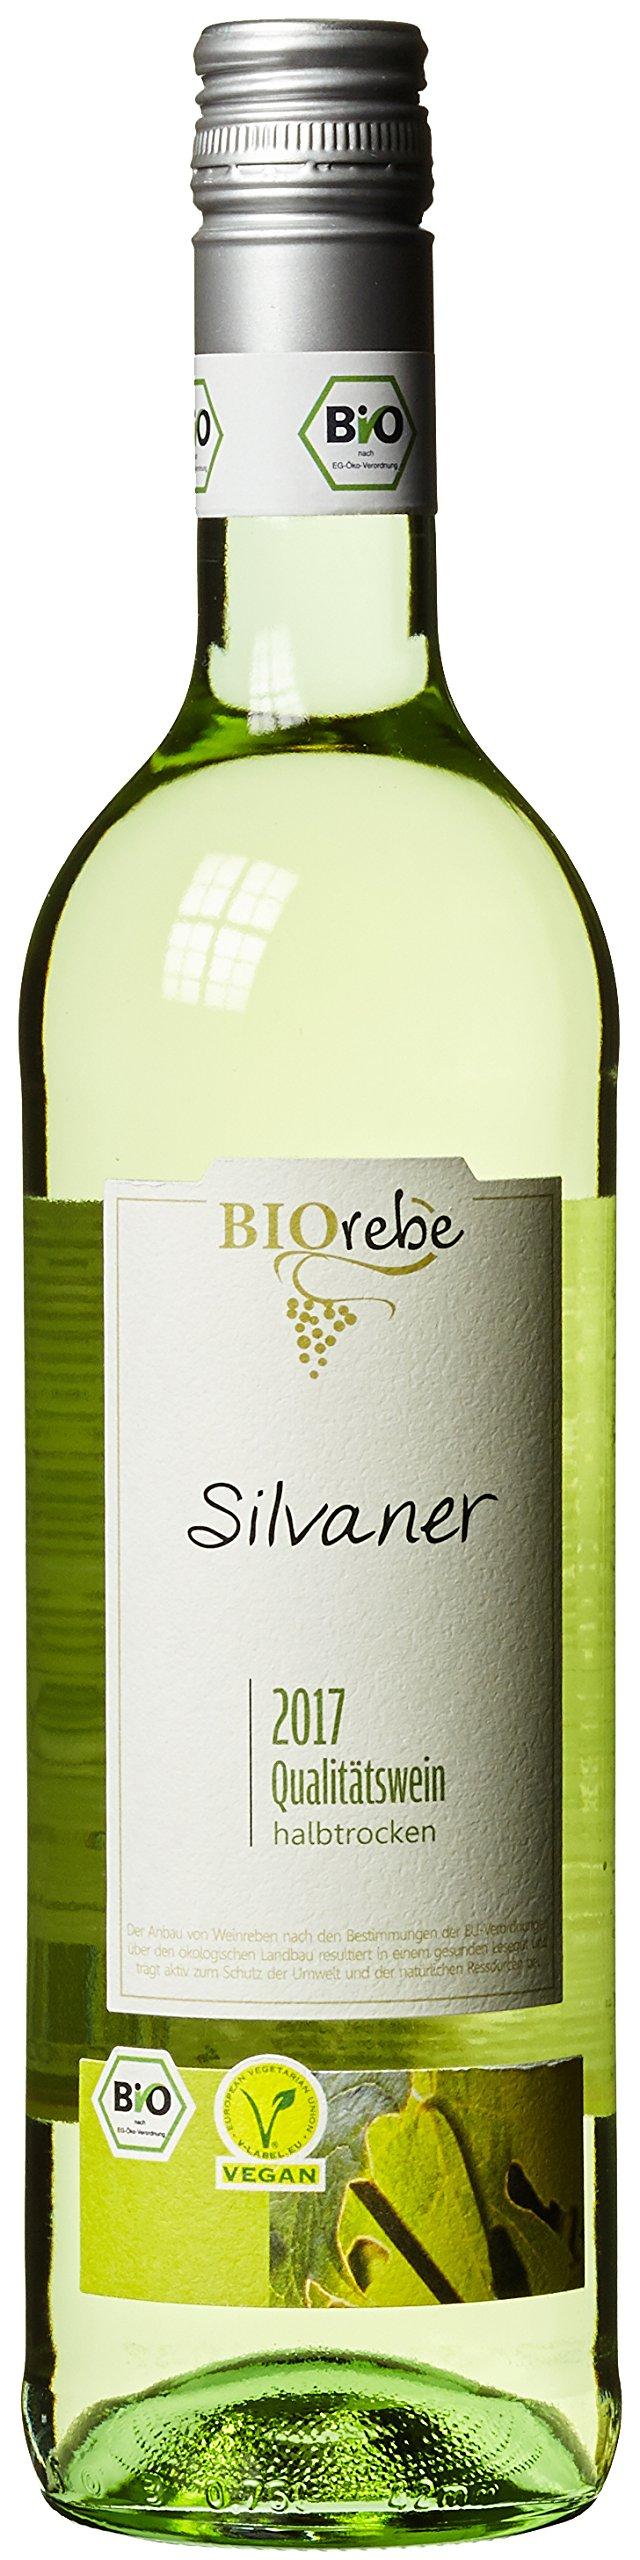 BioRebe-Silvaner-Qualittswein-6-x-075-l